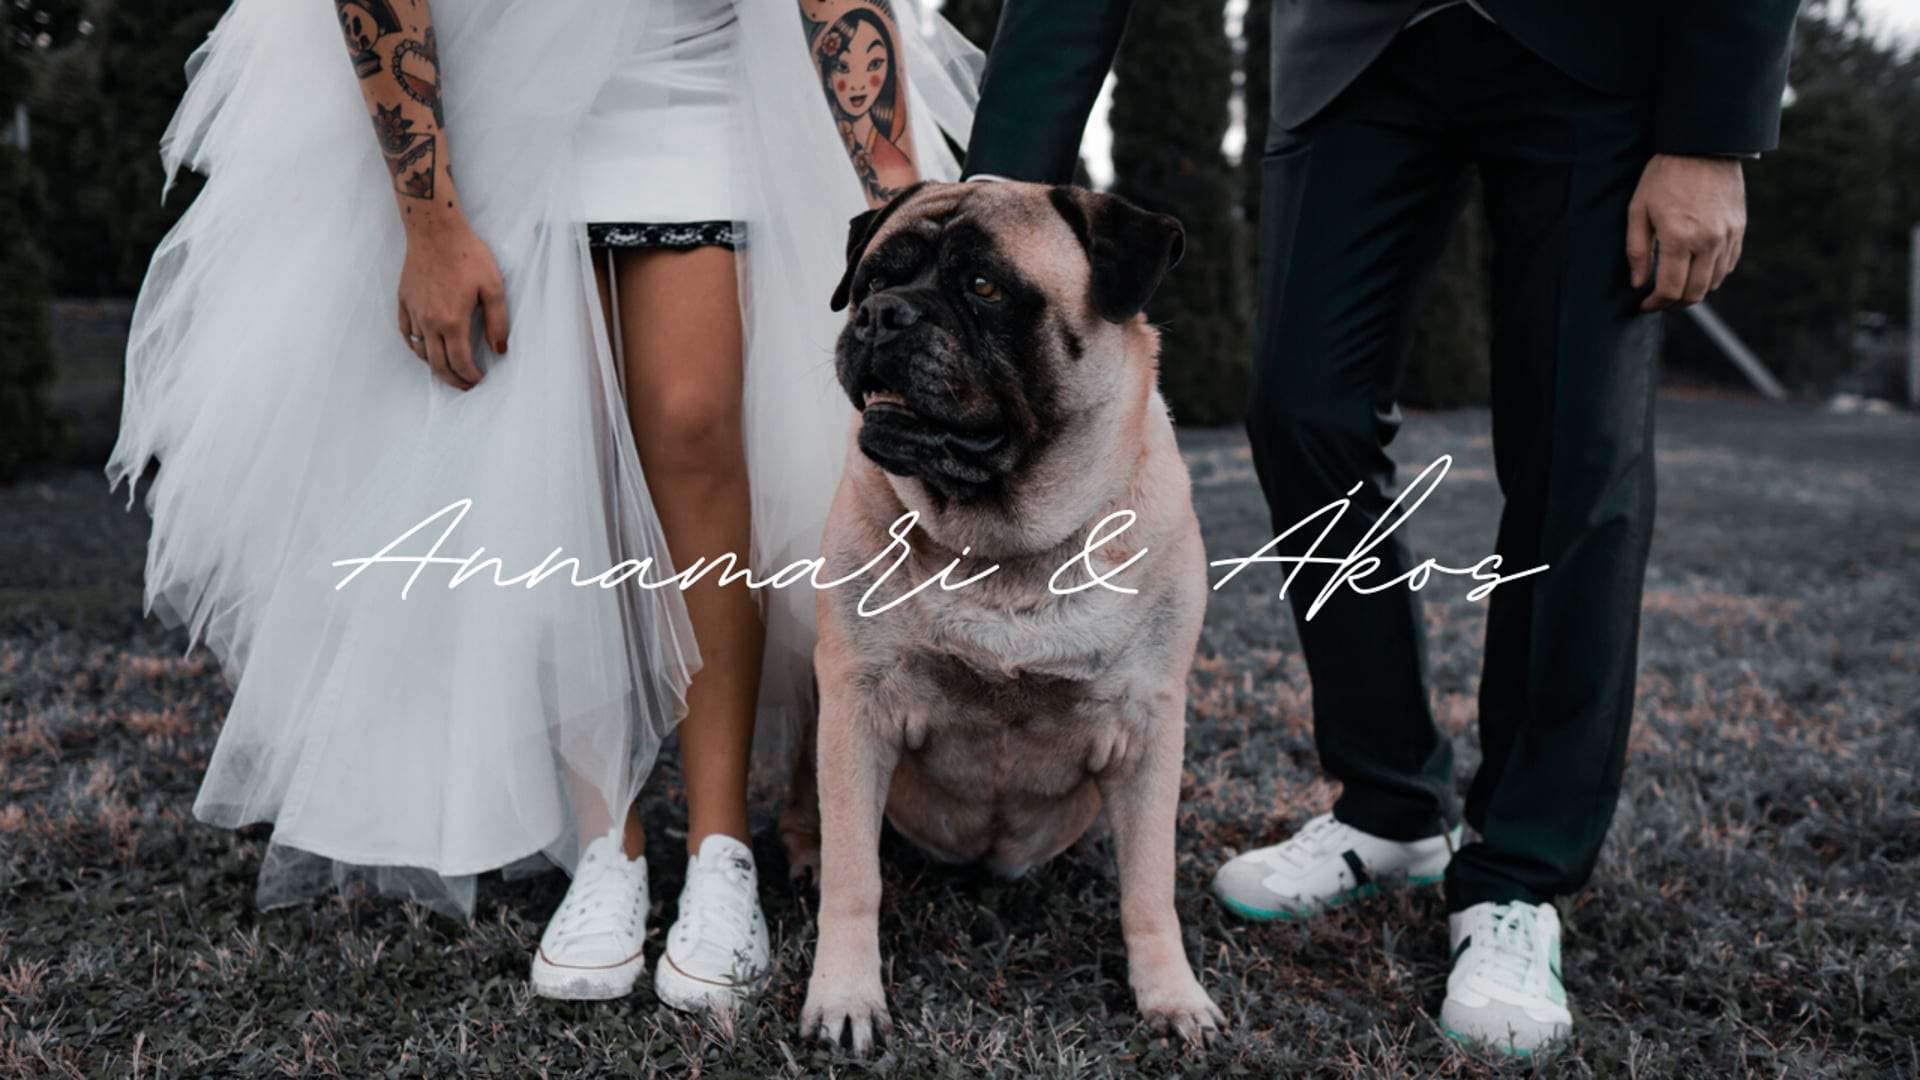 Annamari & Ákos I Wedding highlights